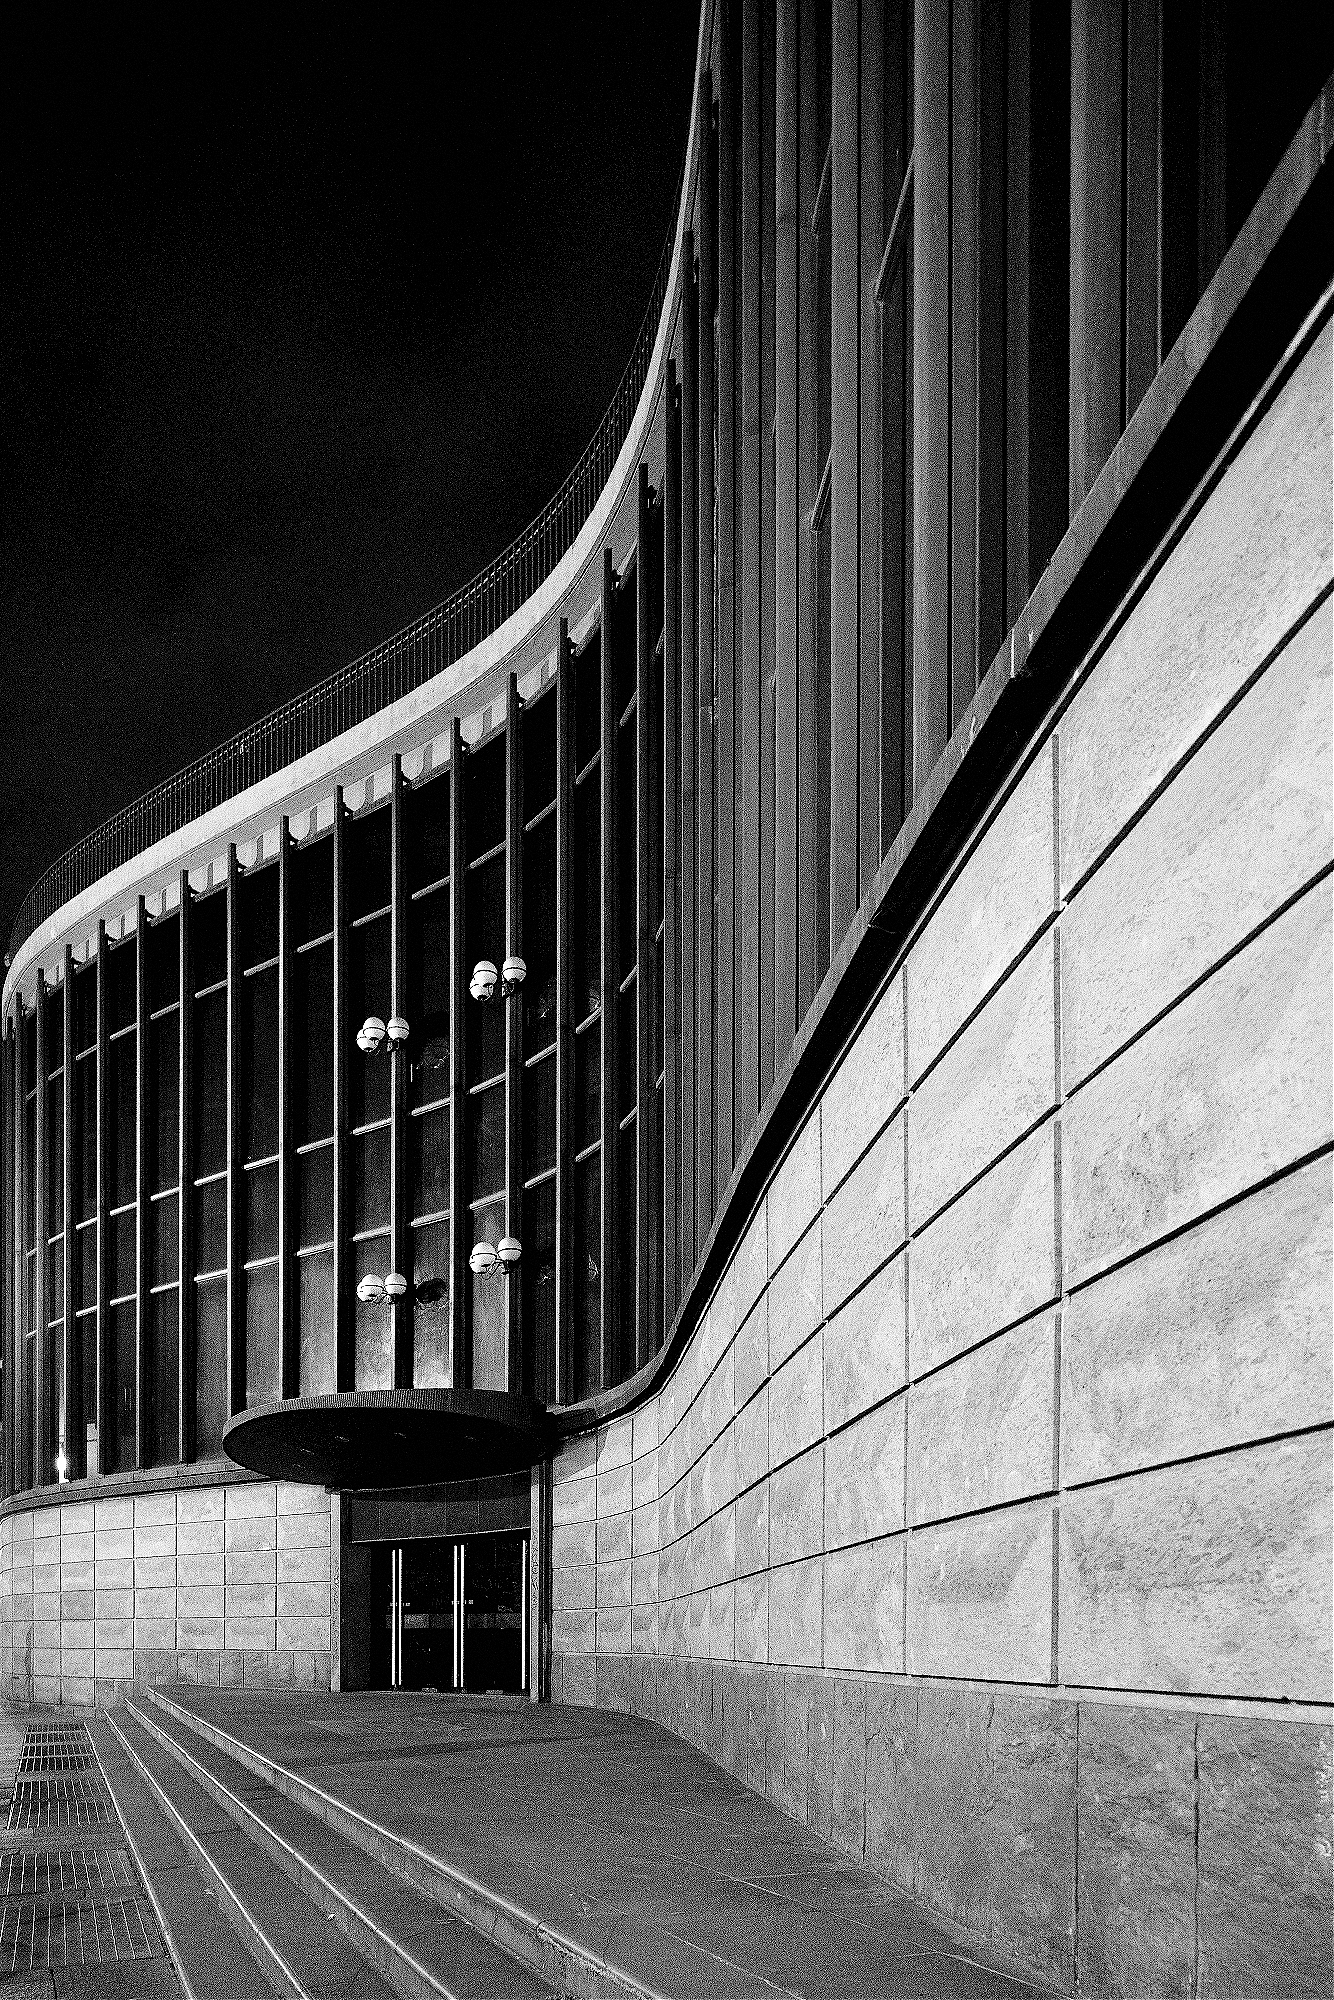 Teatro Regio Torino, Turin